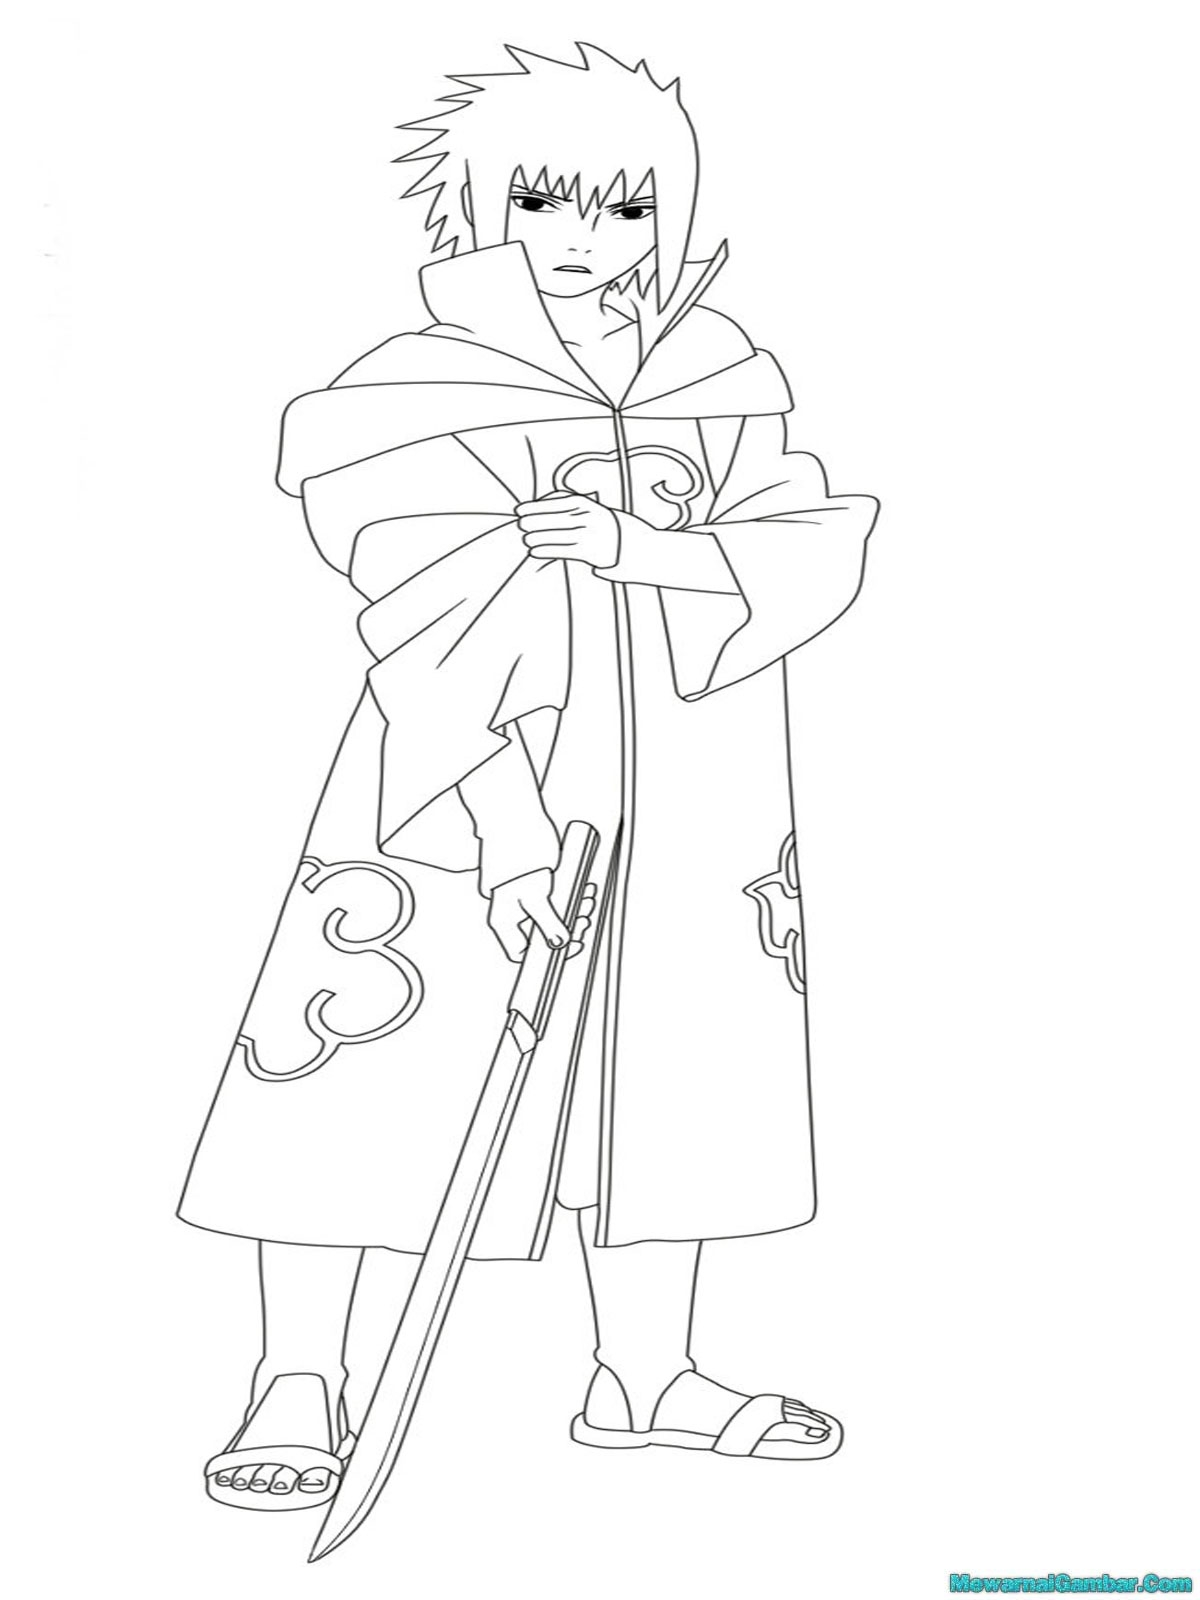 Mewarnai Gambar Sasuke Mewarnai Gambar